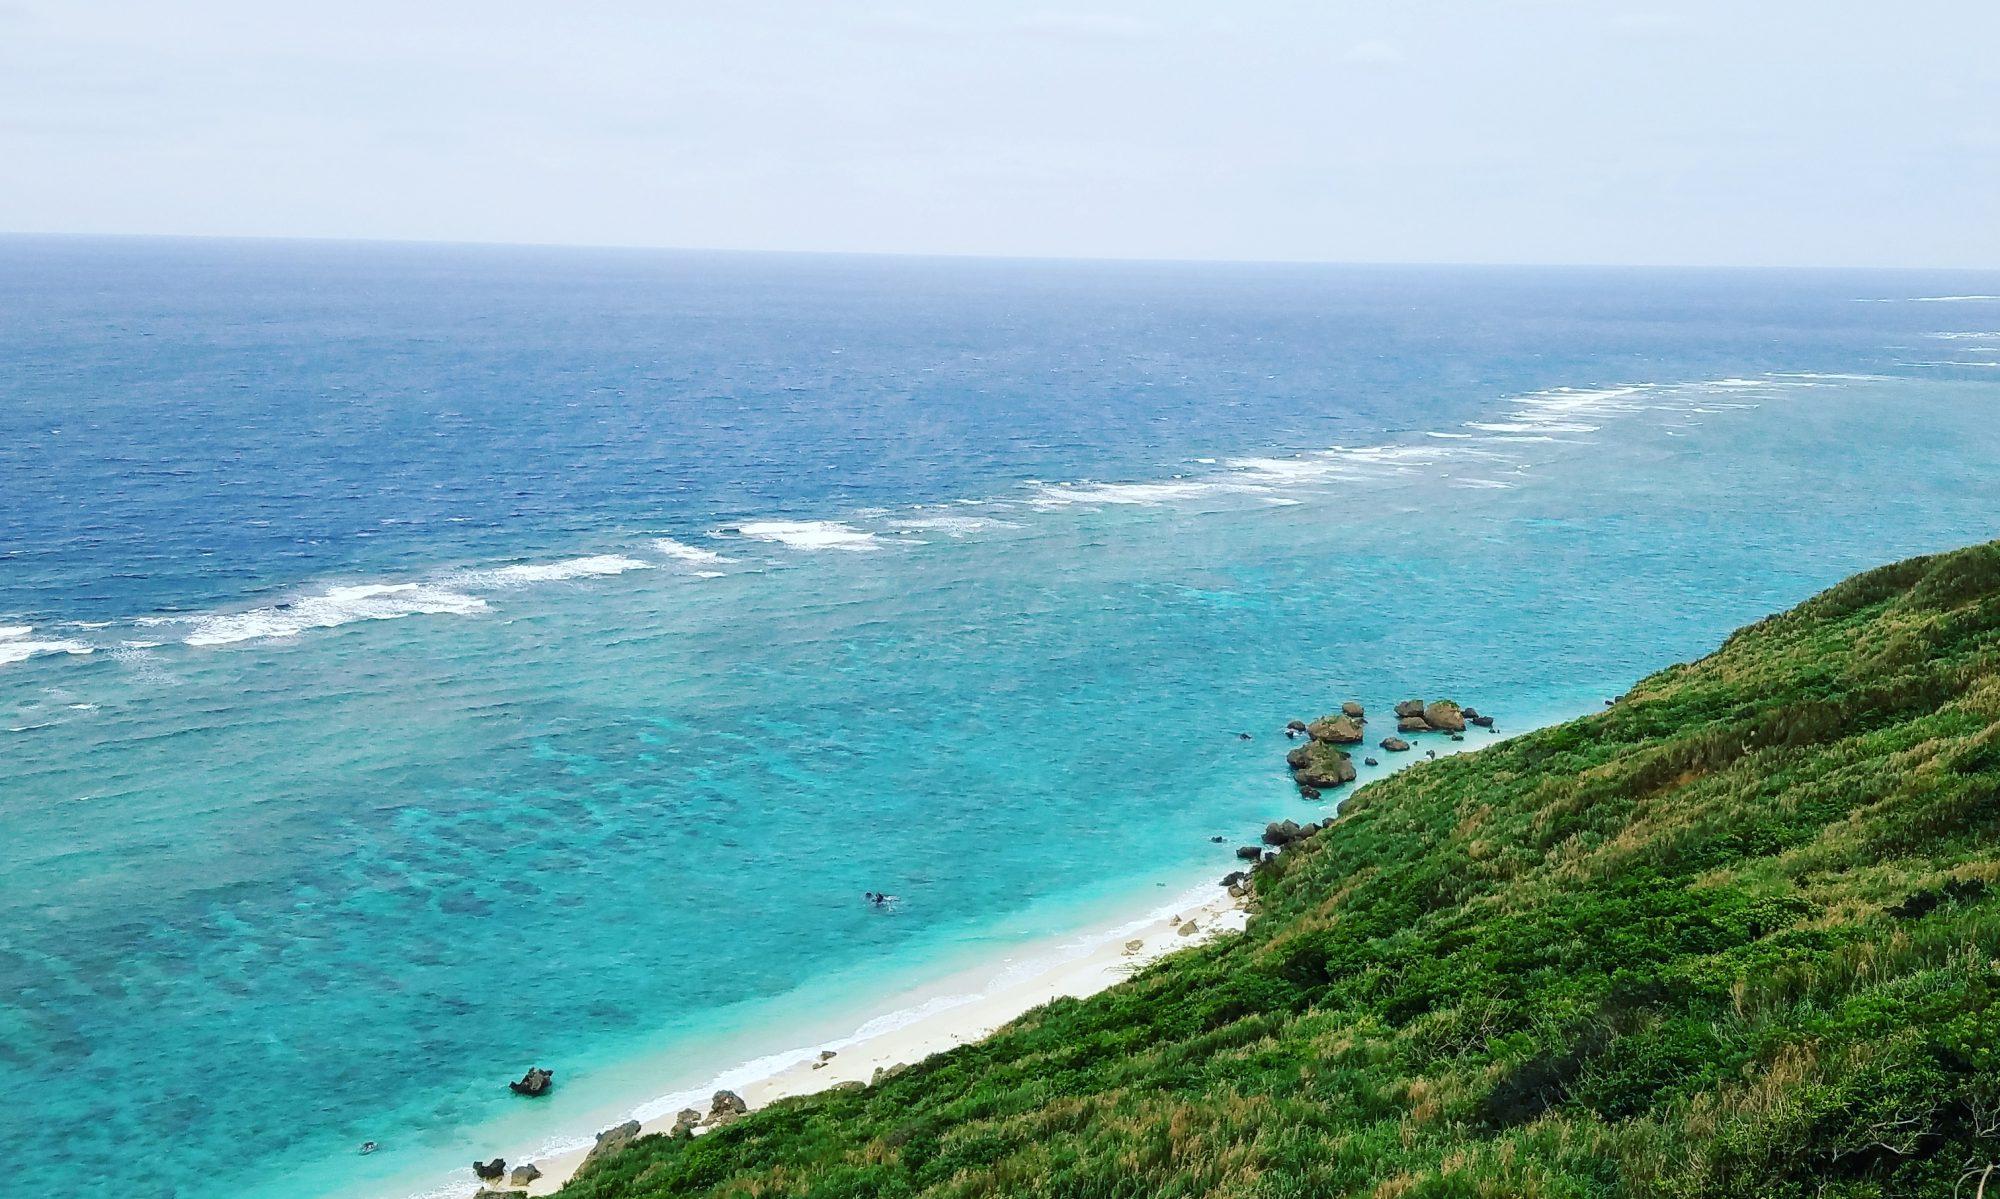 Okinawa AJET